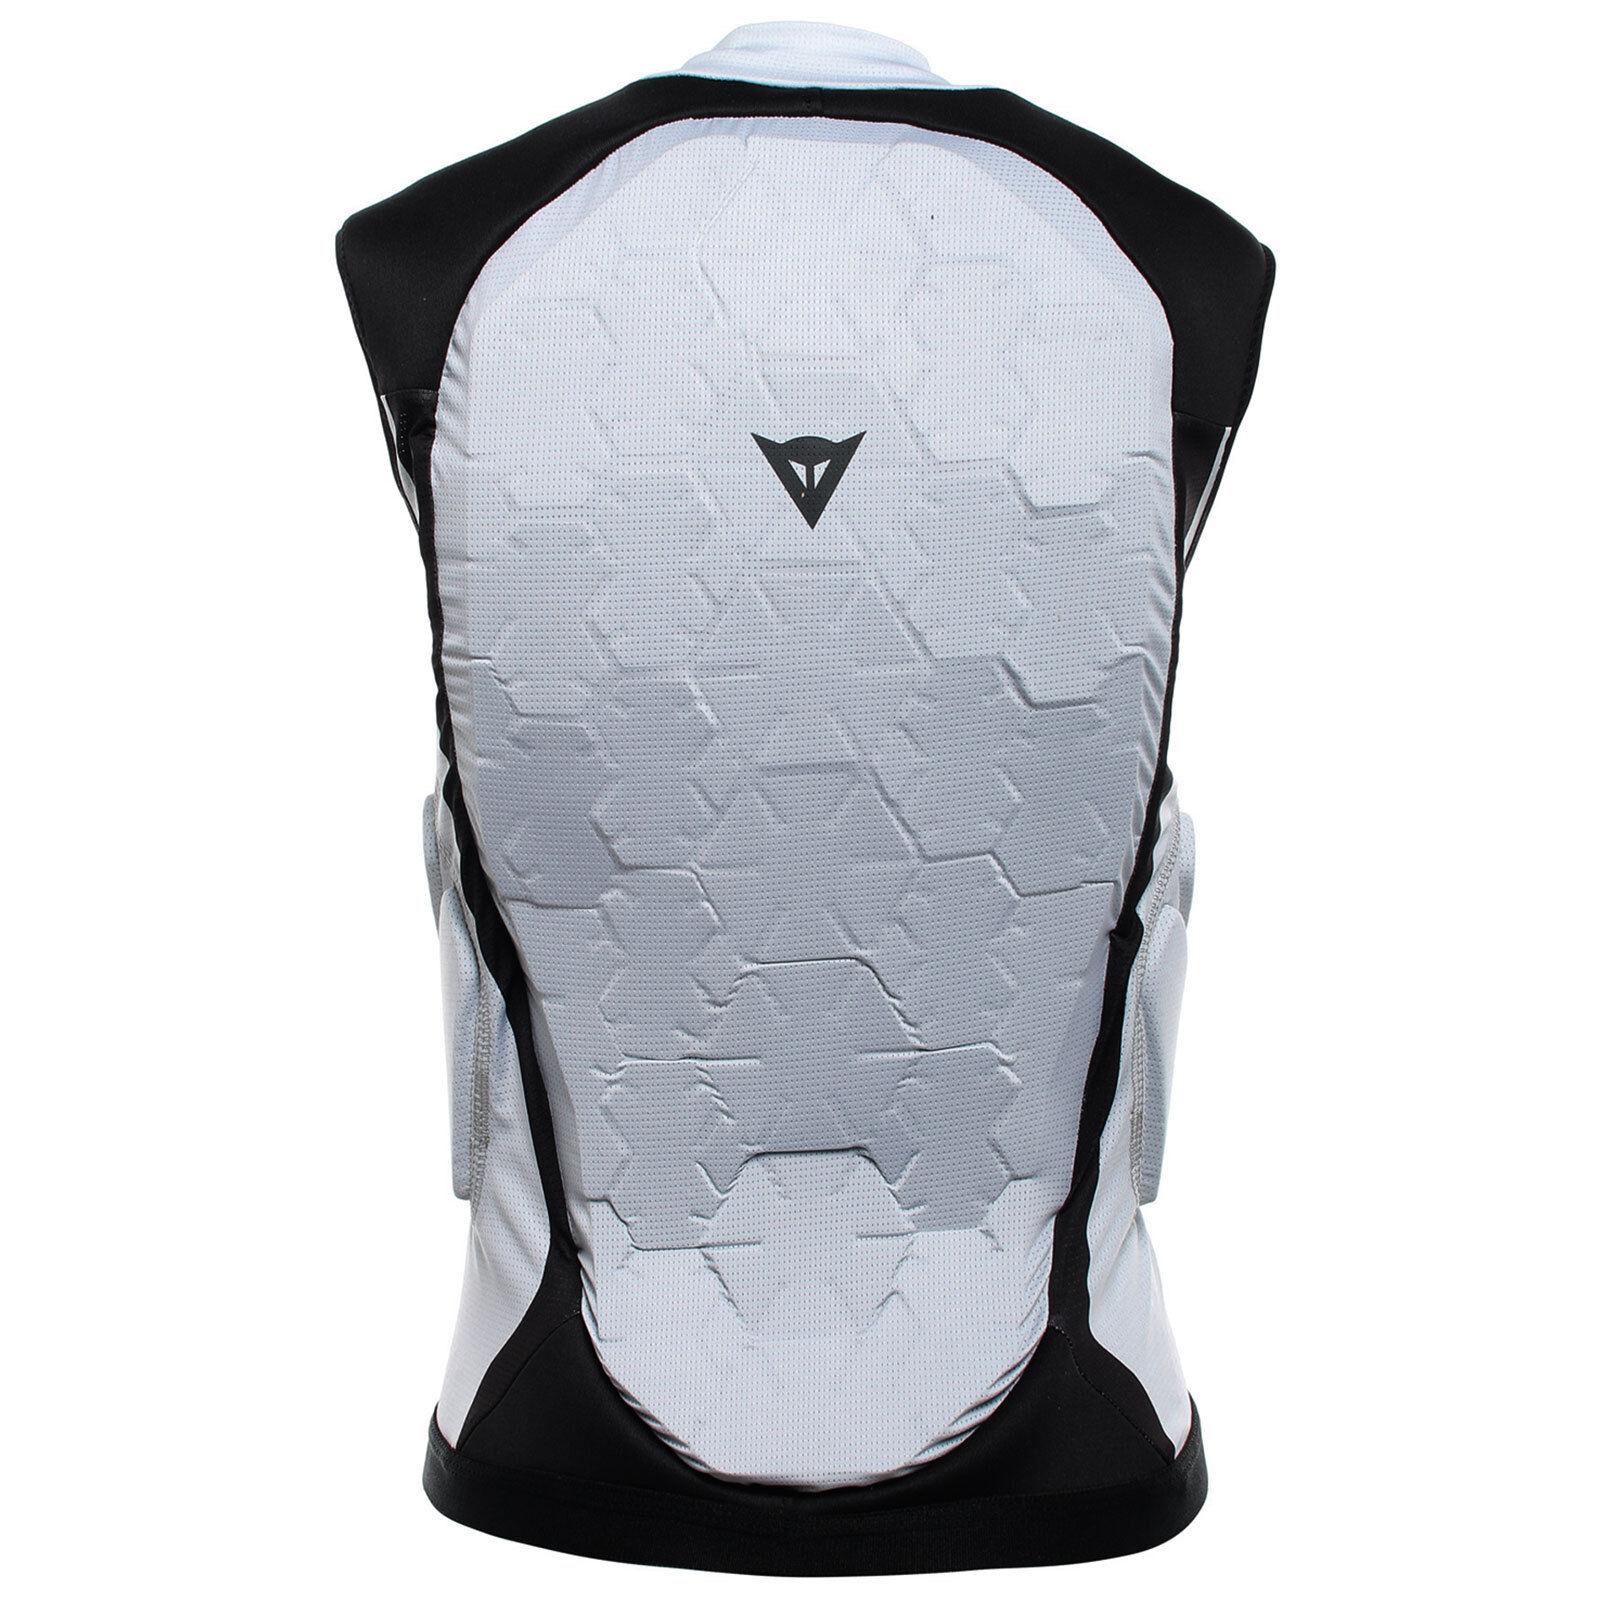 Dainese Flexagon Waistcoat Damen Protektor Rückenschutz Rückenschutz Rückenschutz Protektor-Weste Schutz bc317b